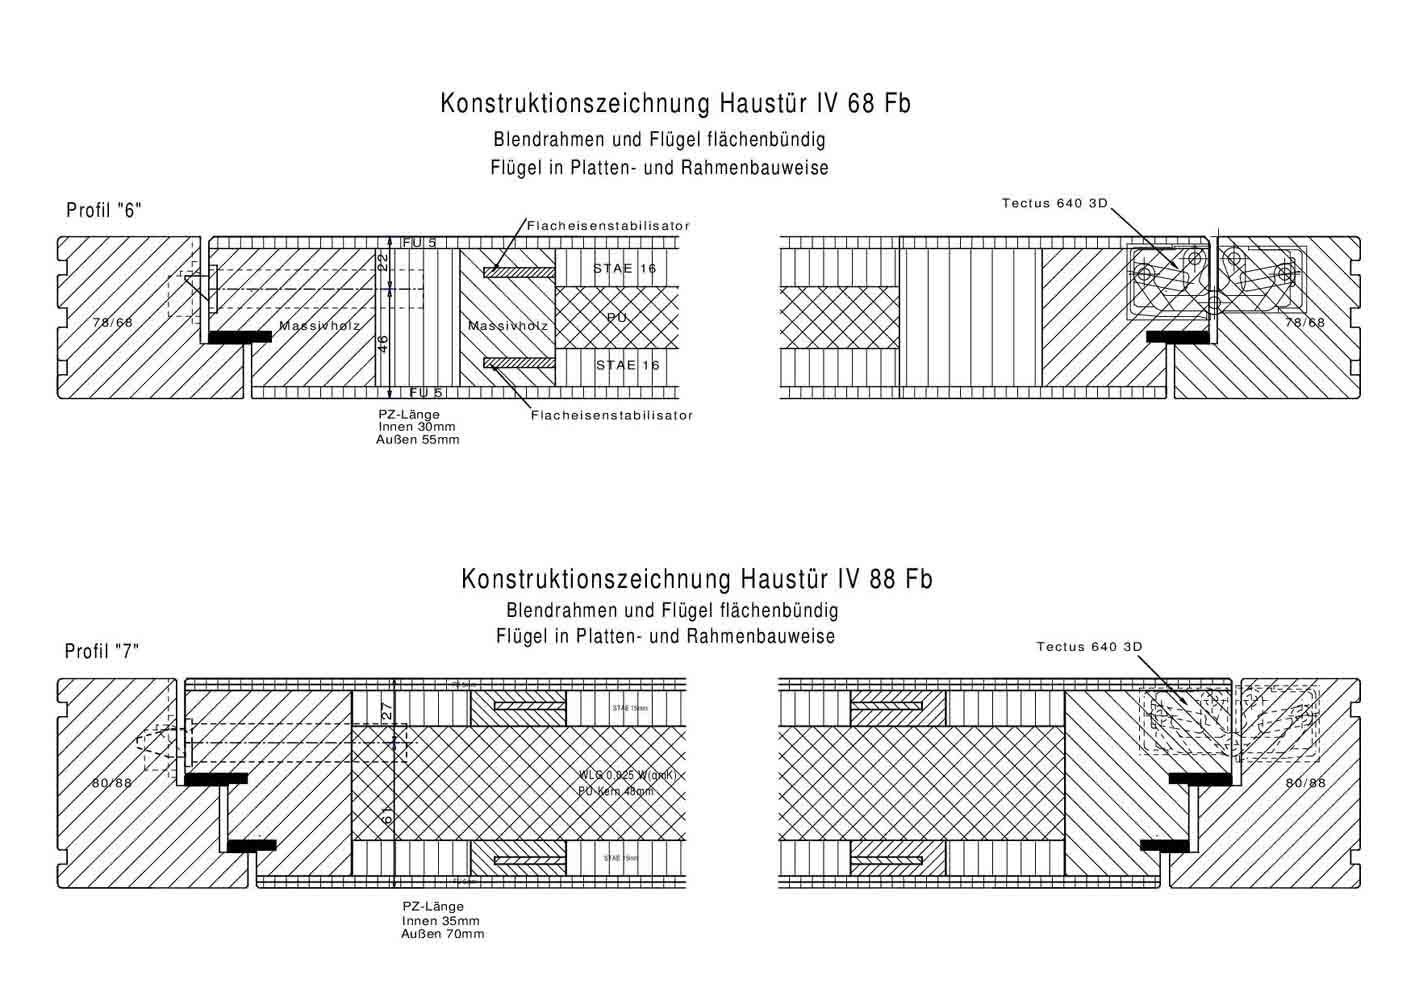 Eingangstür detail schnitt  Haustüren Brunkhorst, Haustüren aus Holz, Holzhaustüren ...